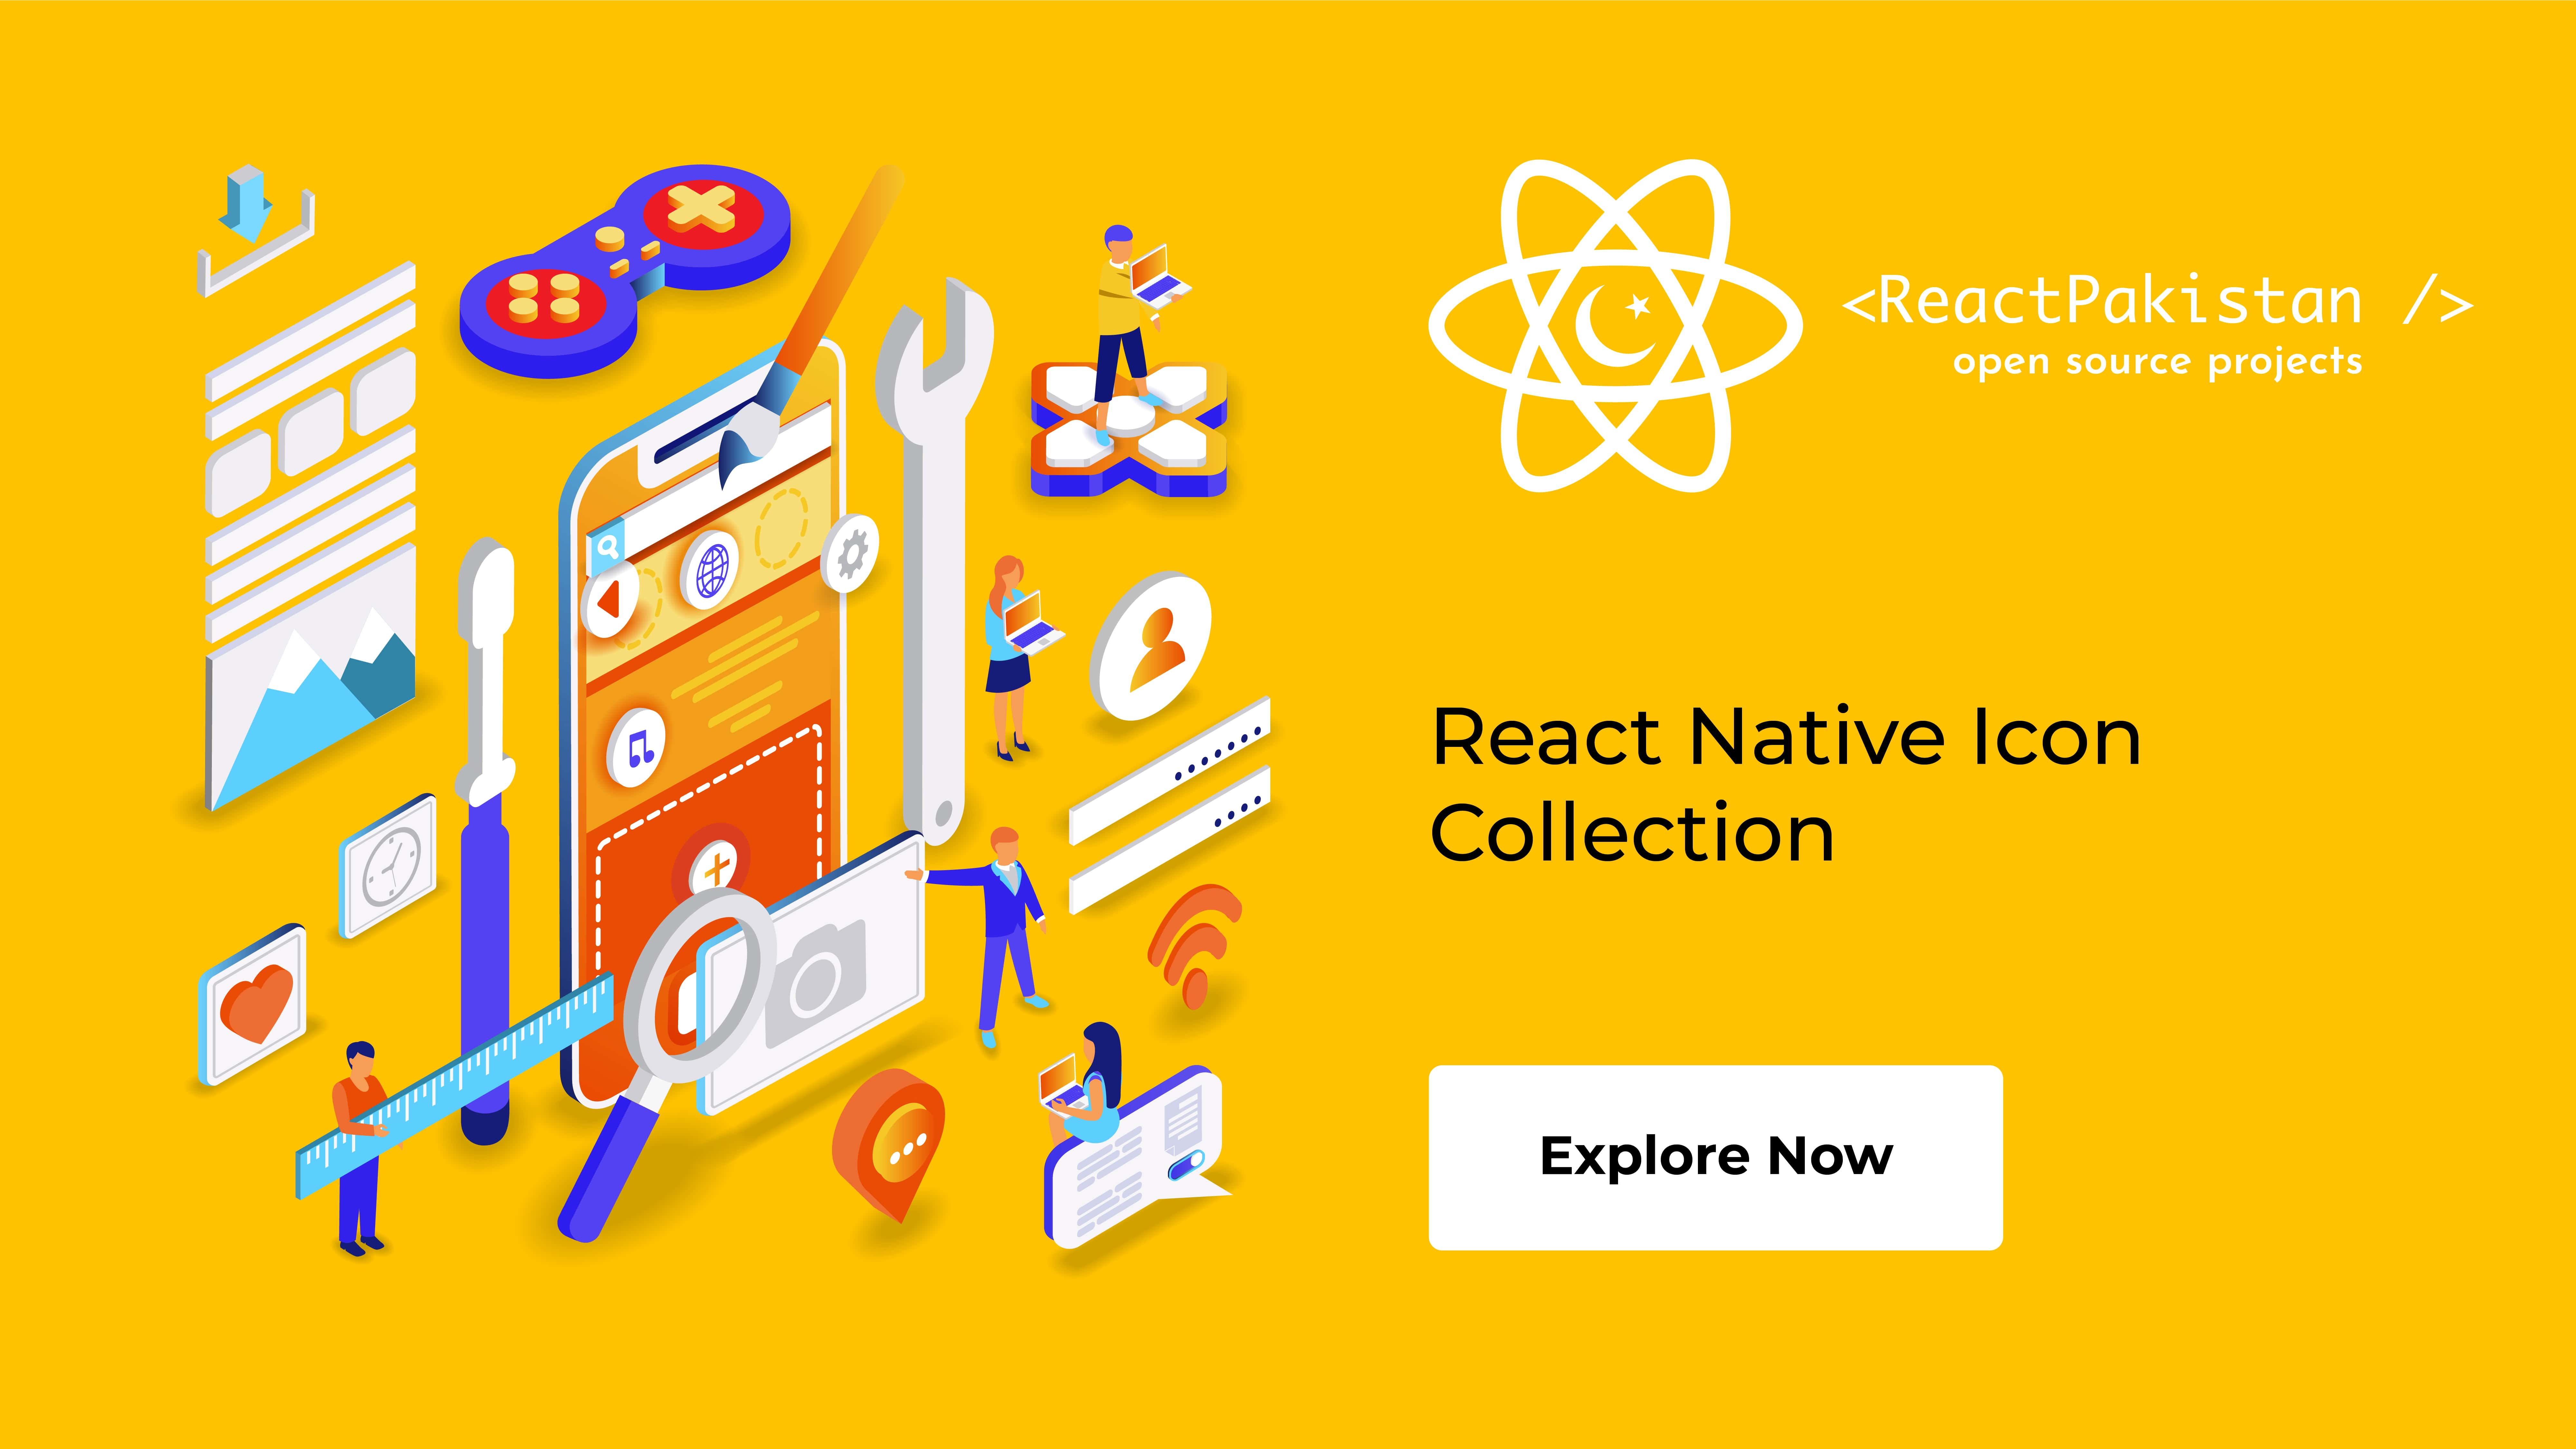 React Pakistan - React Native Icon Collection